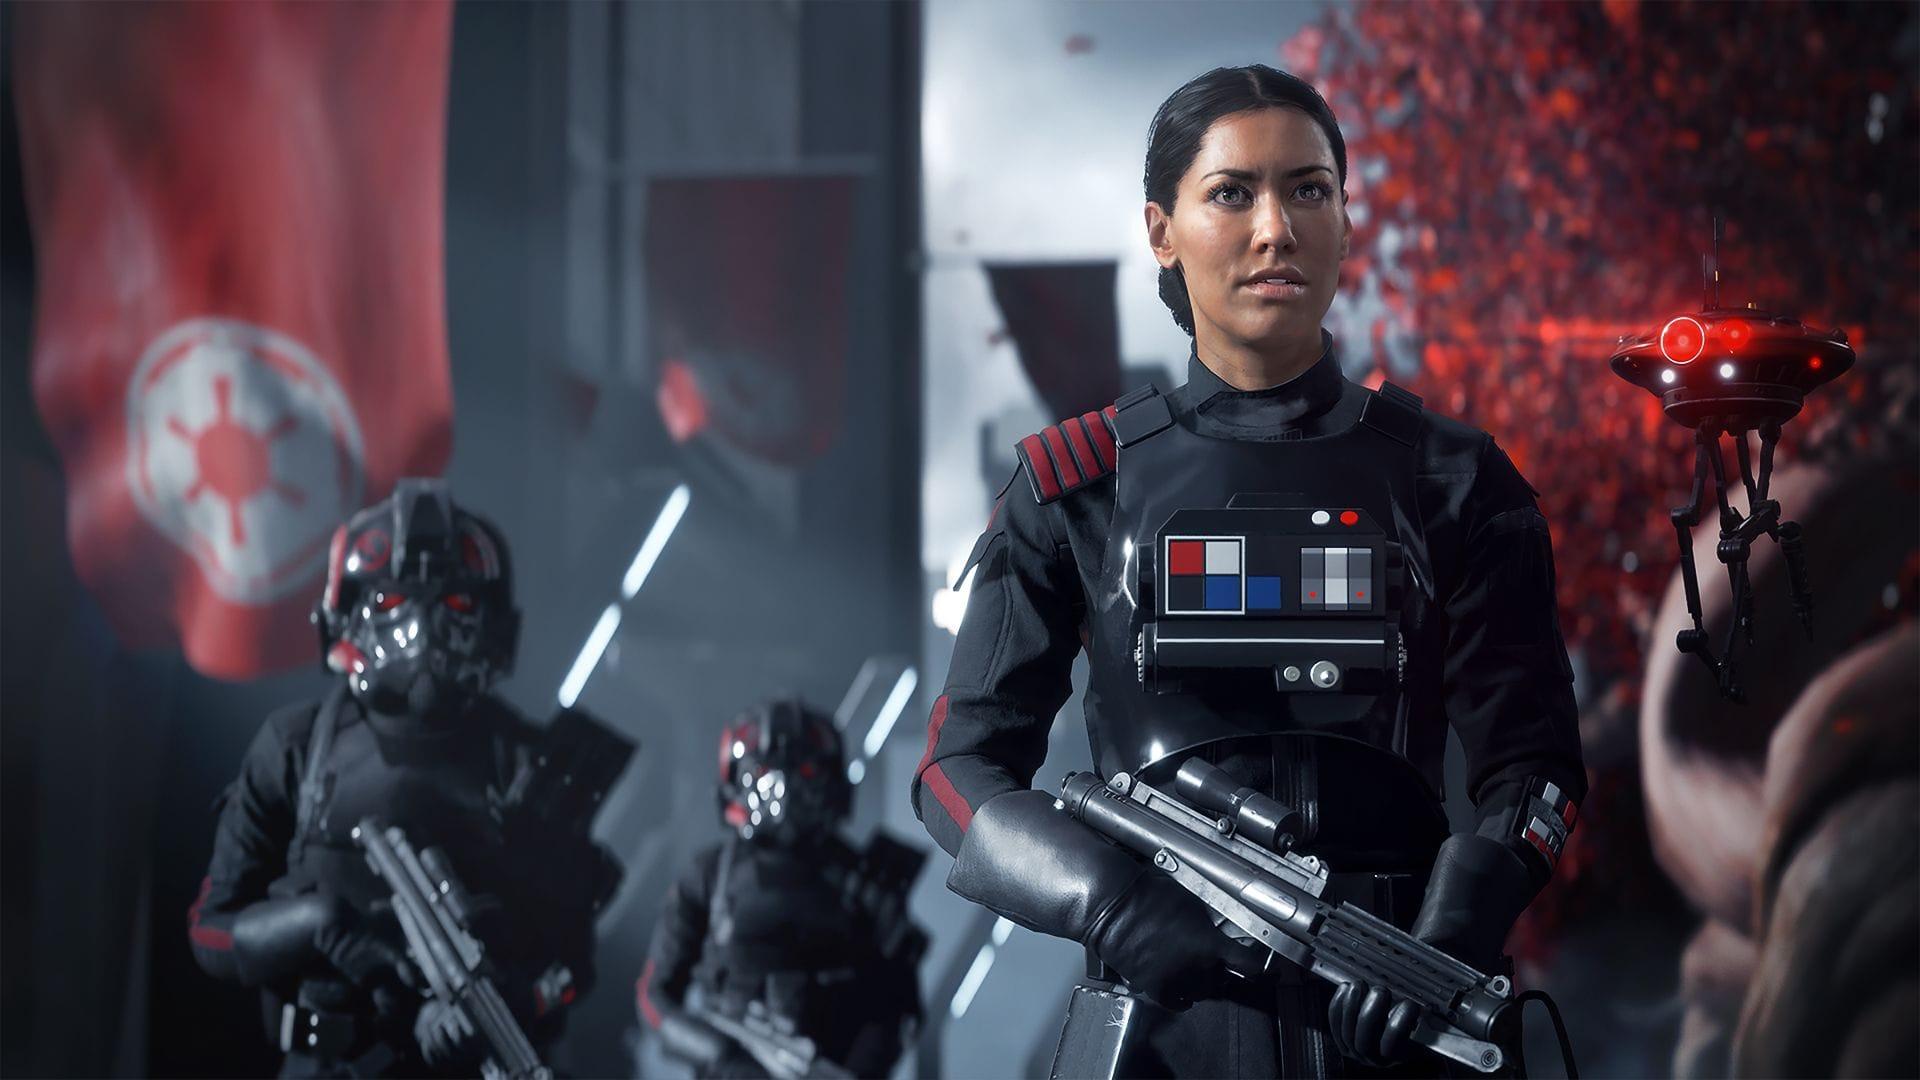 EMPRESS взломала Star Wars: Battlefront 2